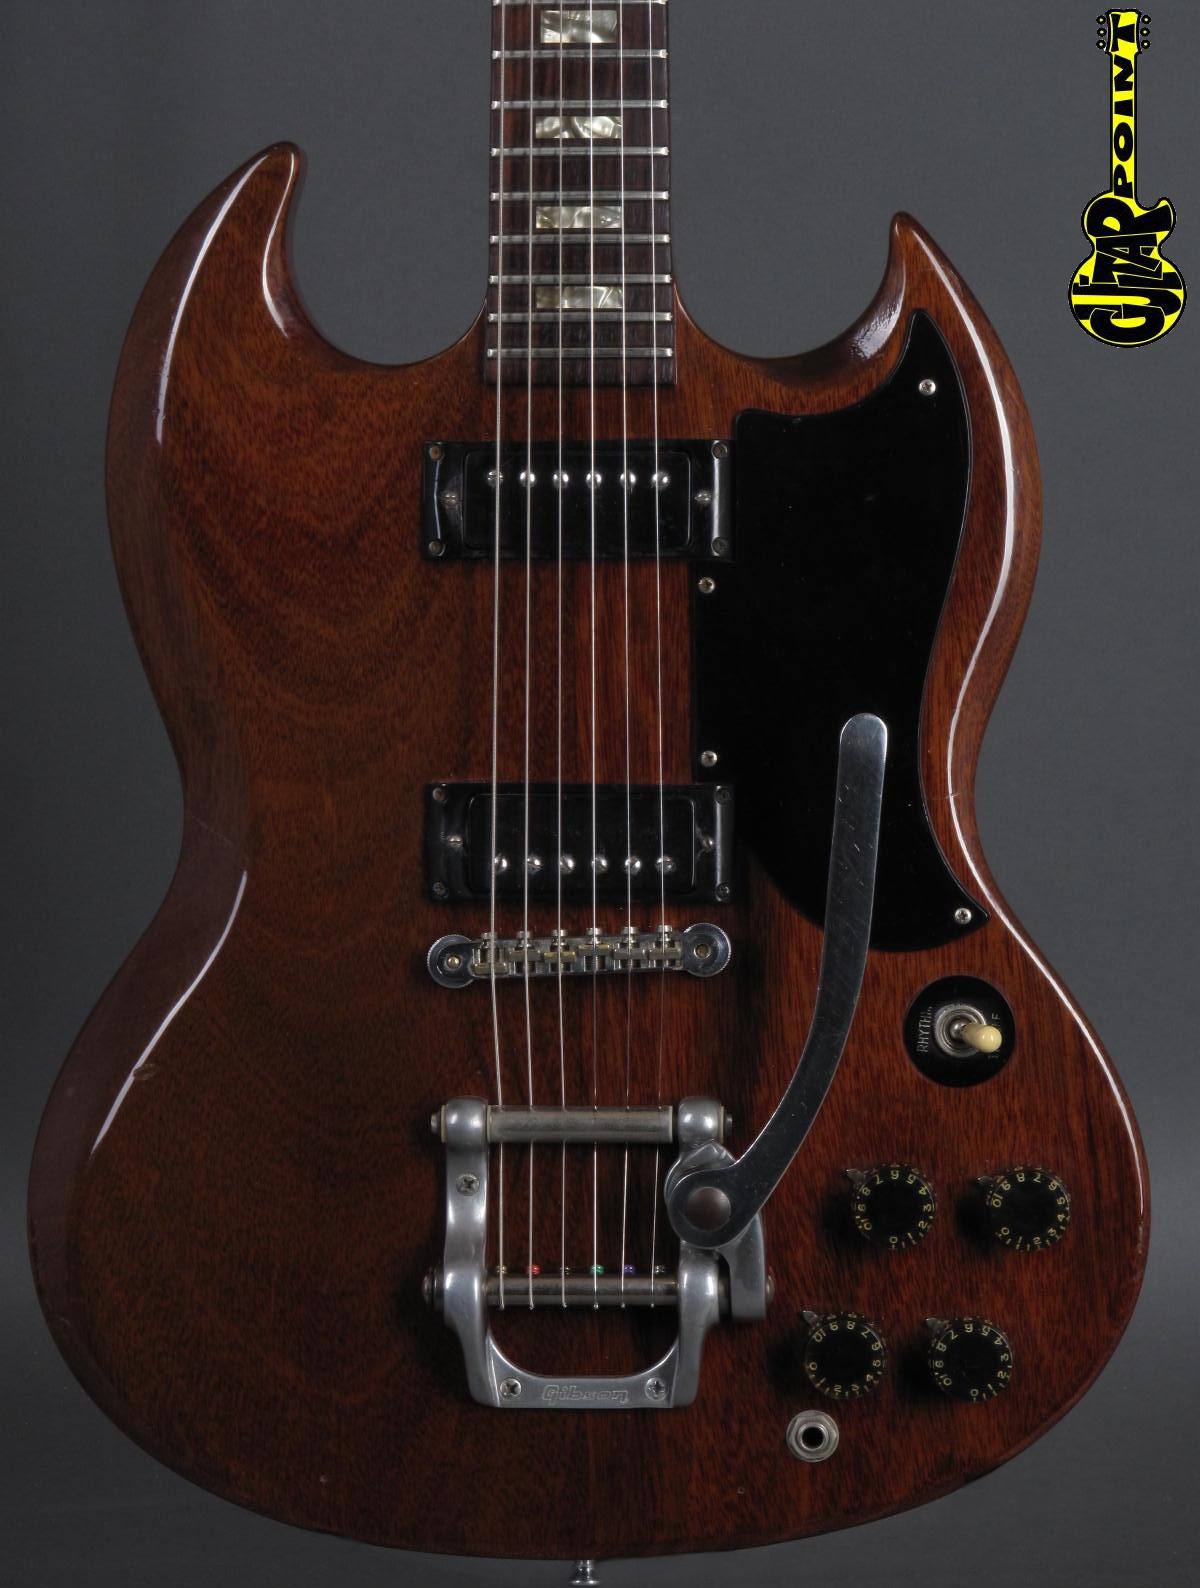 1973 Gibson SG Special - Cherry   ...rare w/Mini-humbuckers!